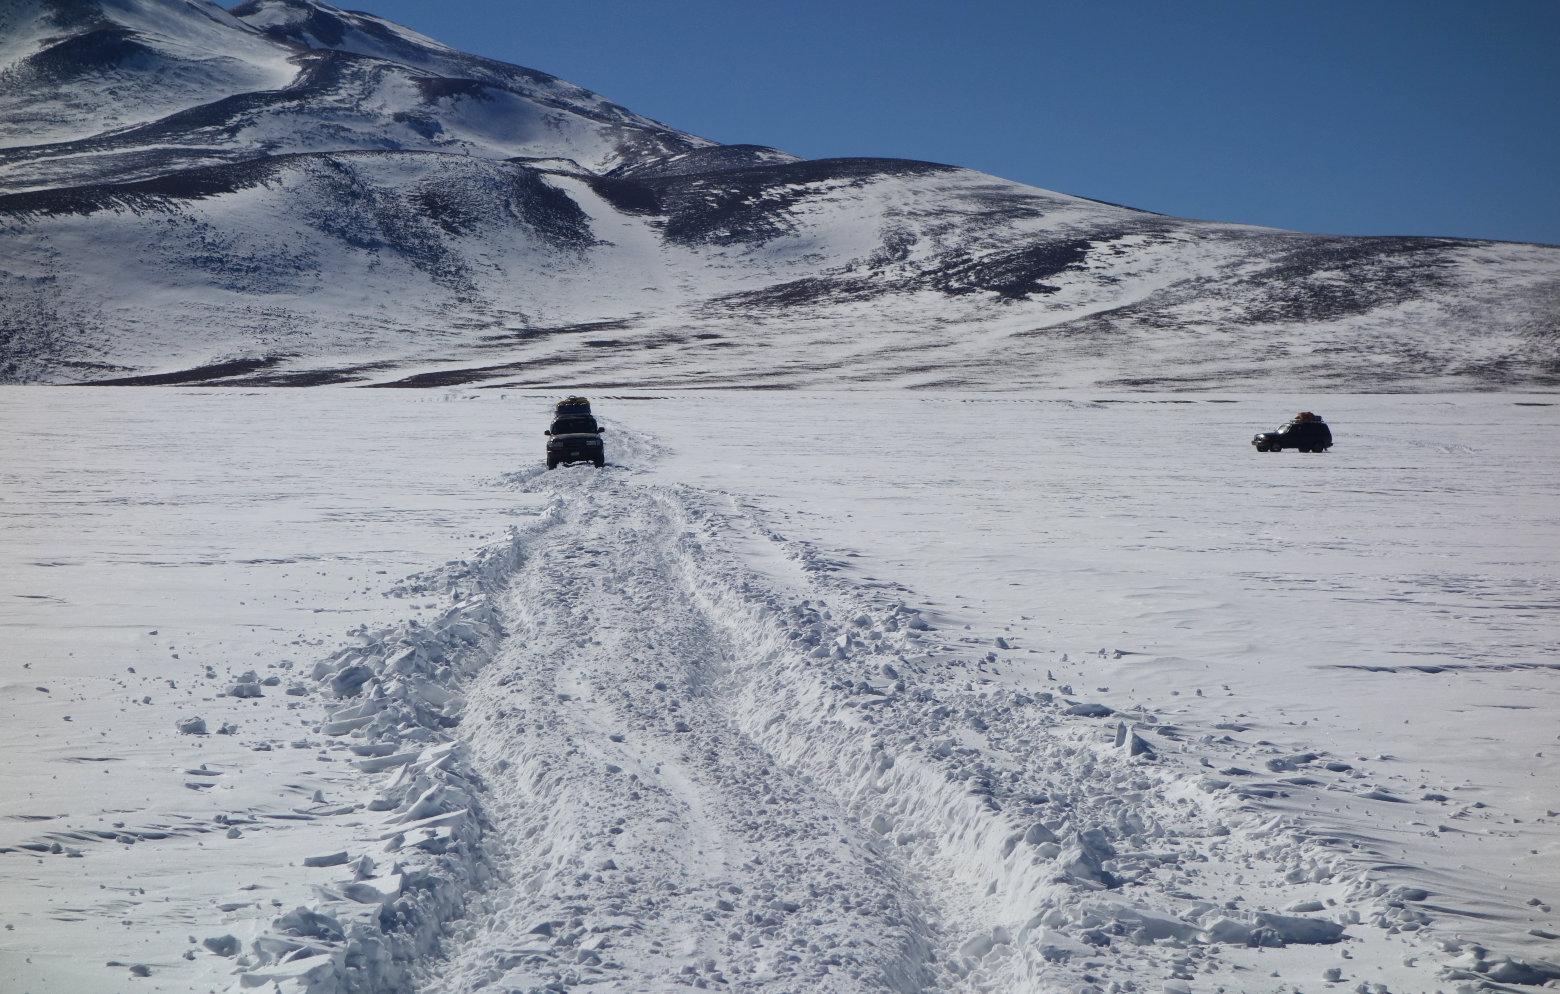 Salar de Uyuni Jeep im Schnee